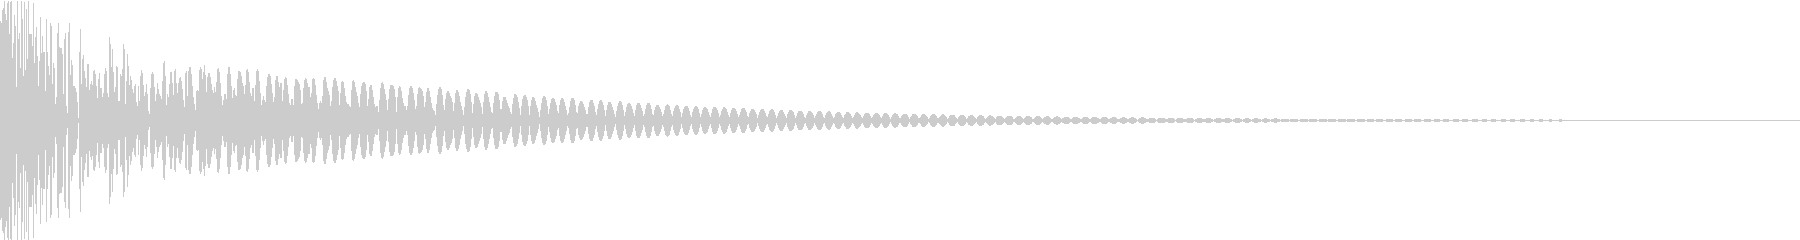 DTM Tom 6 オリジナル音源の未再生の波形